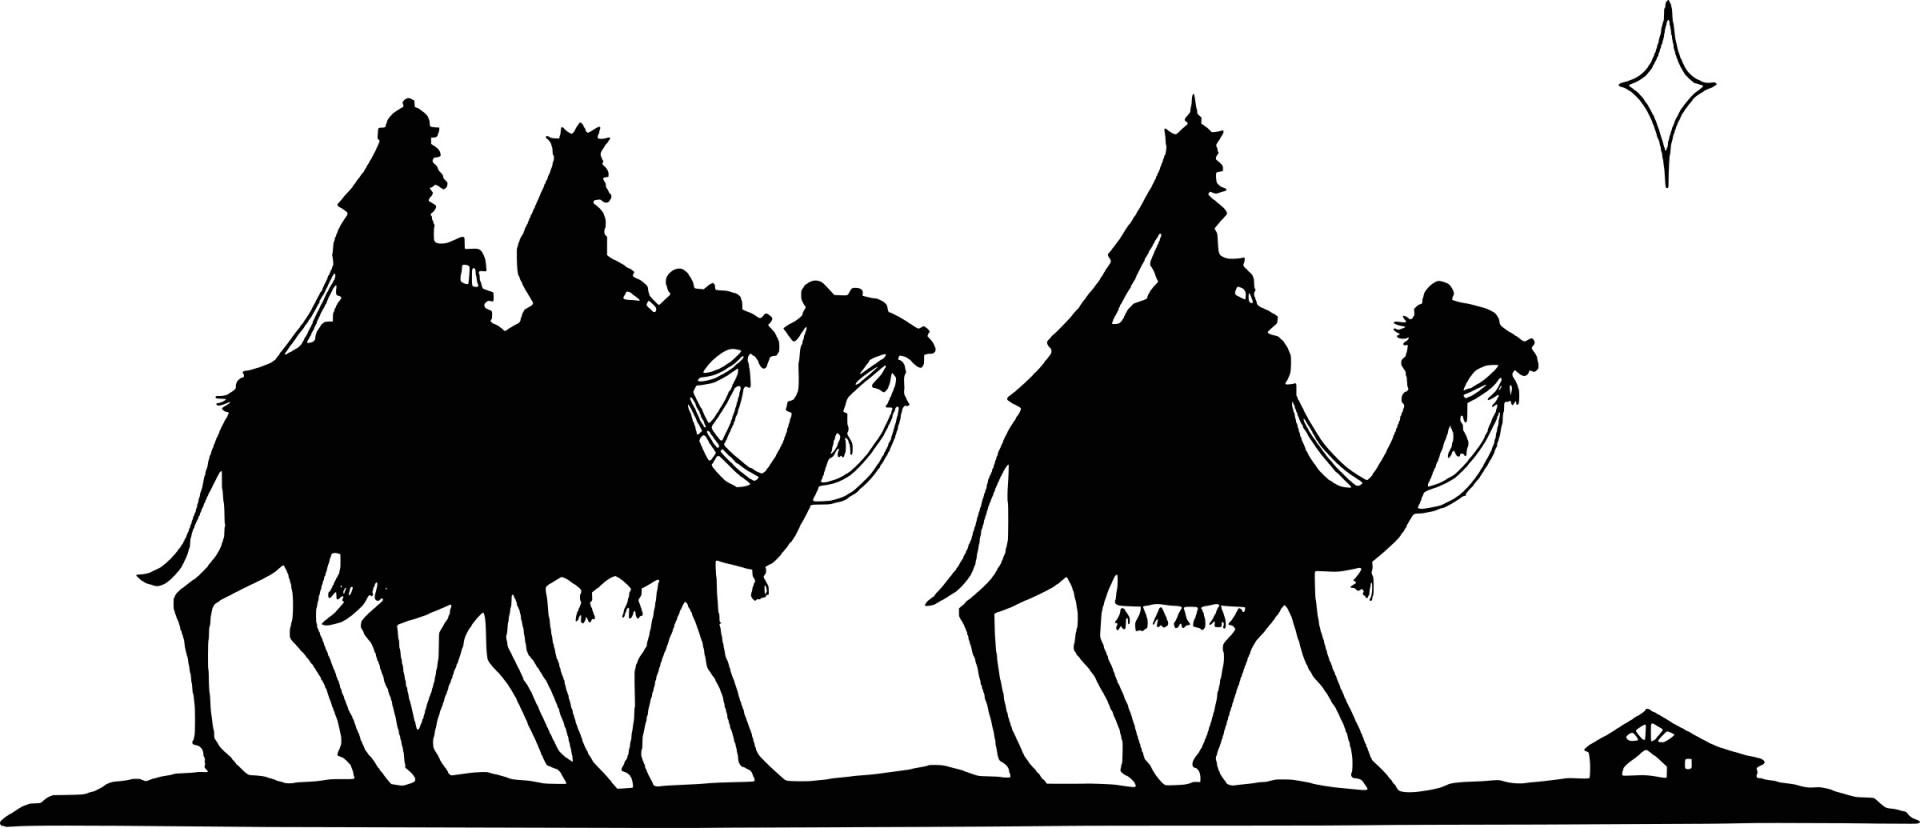 Holy Night, Christmas, Savior is Born, Wise Men